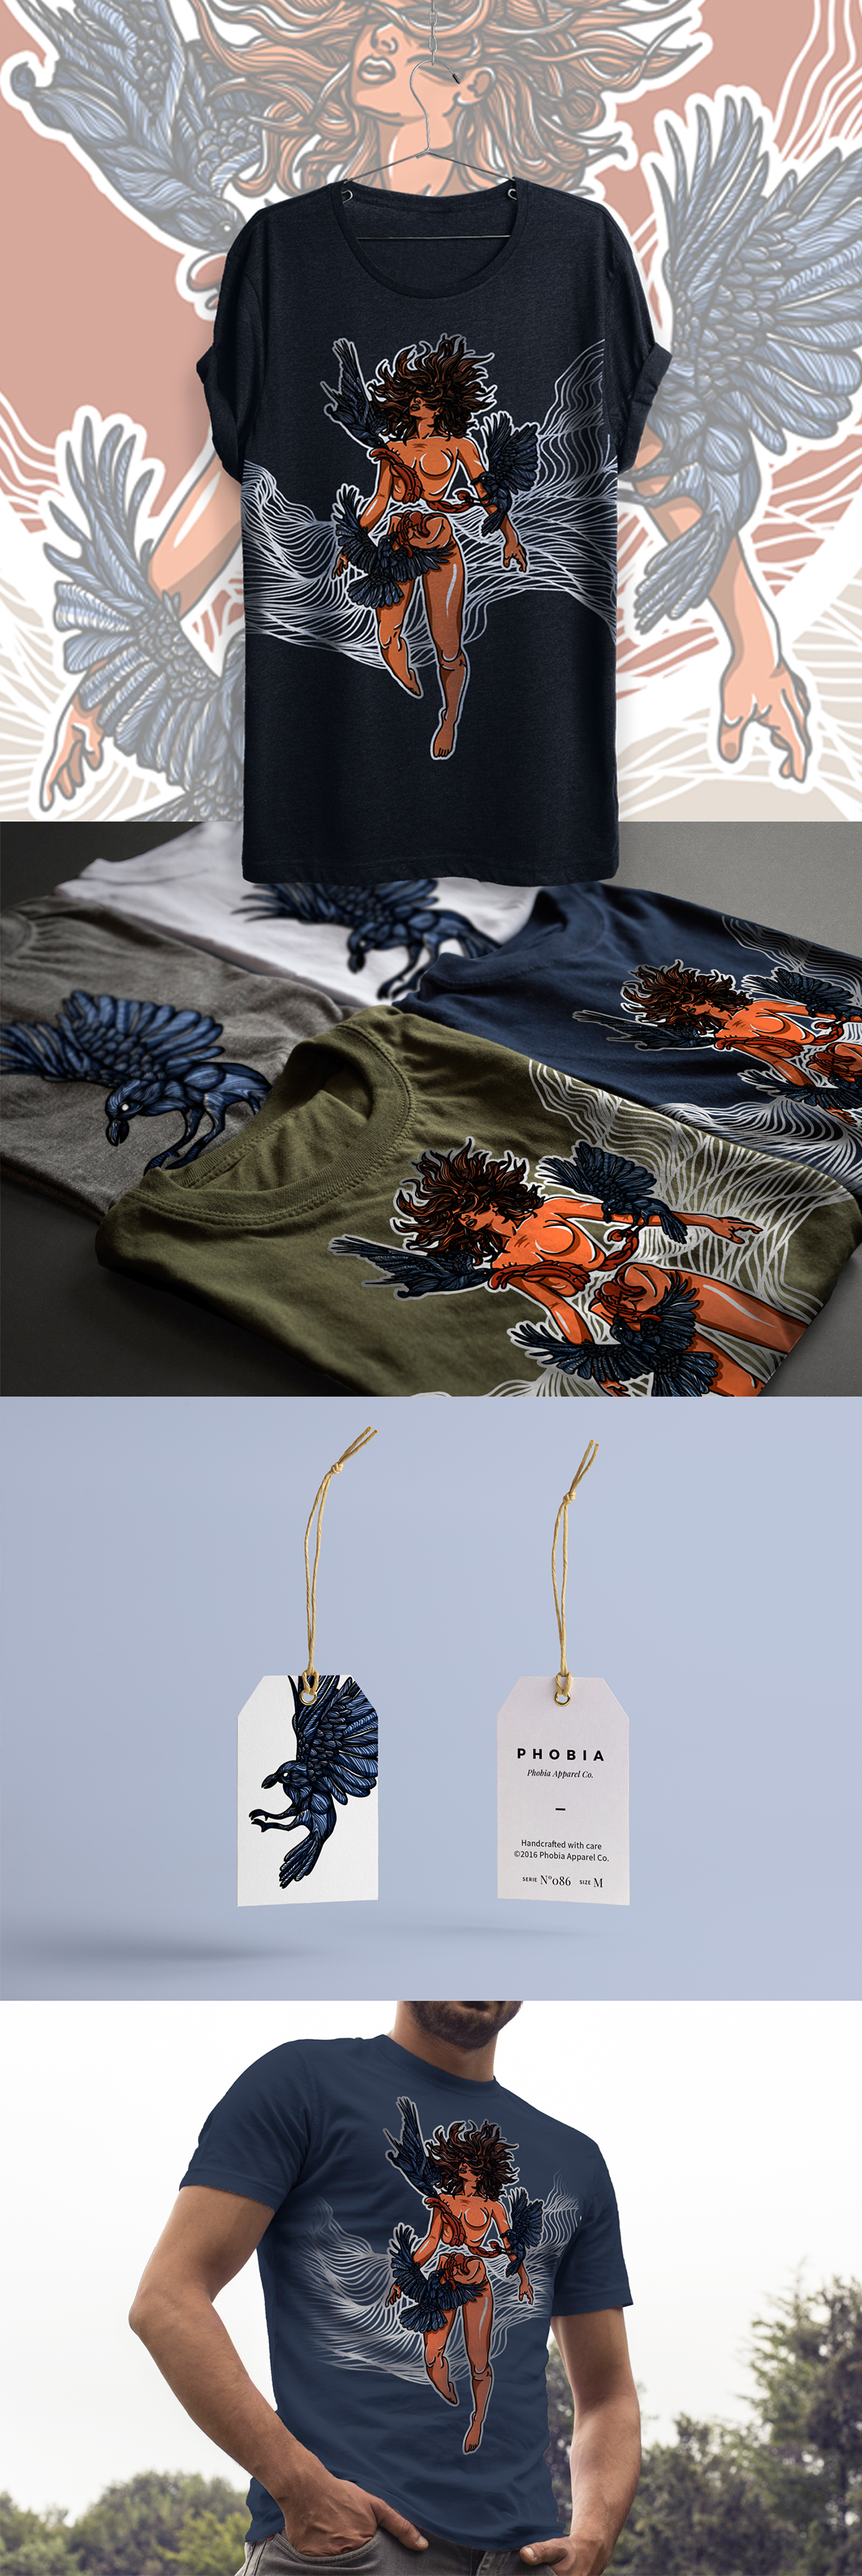 screen print shirt design birds woman SILK fear phobia apparel